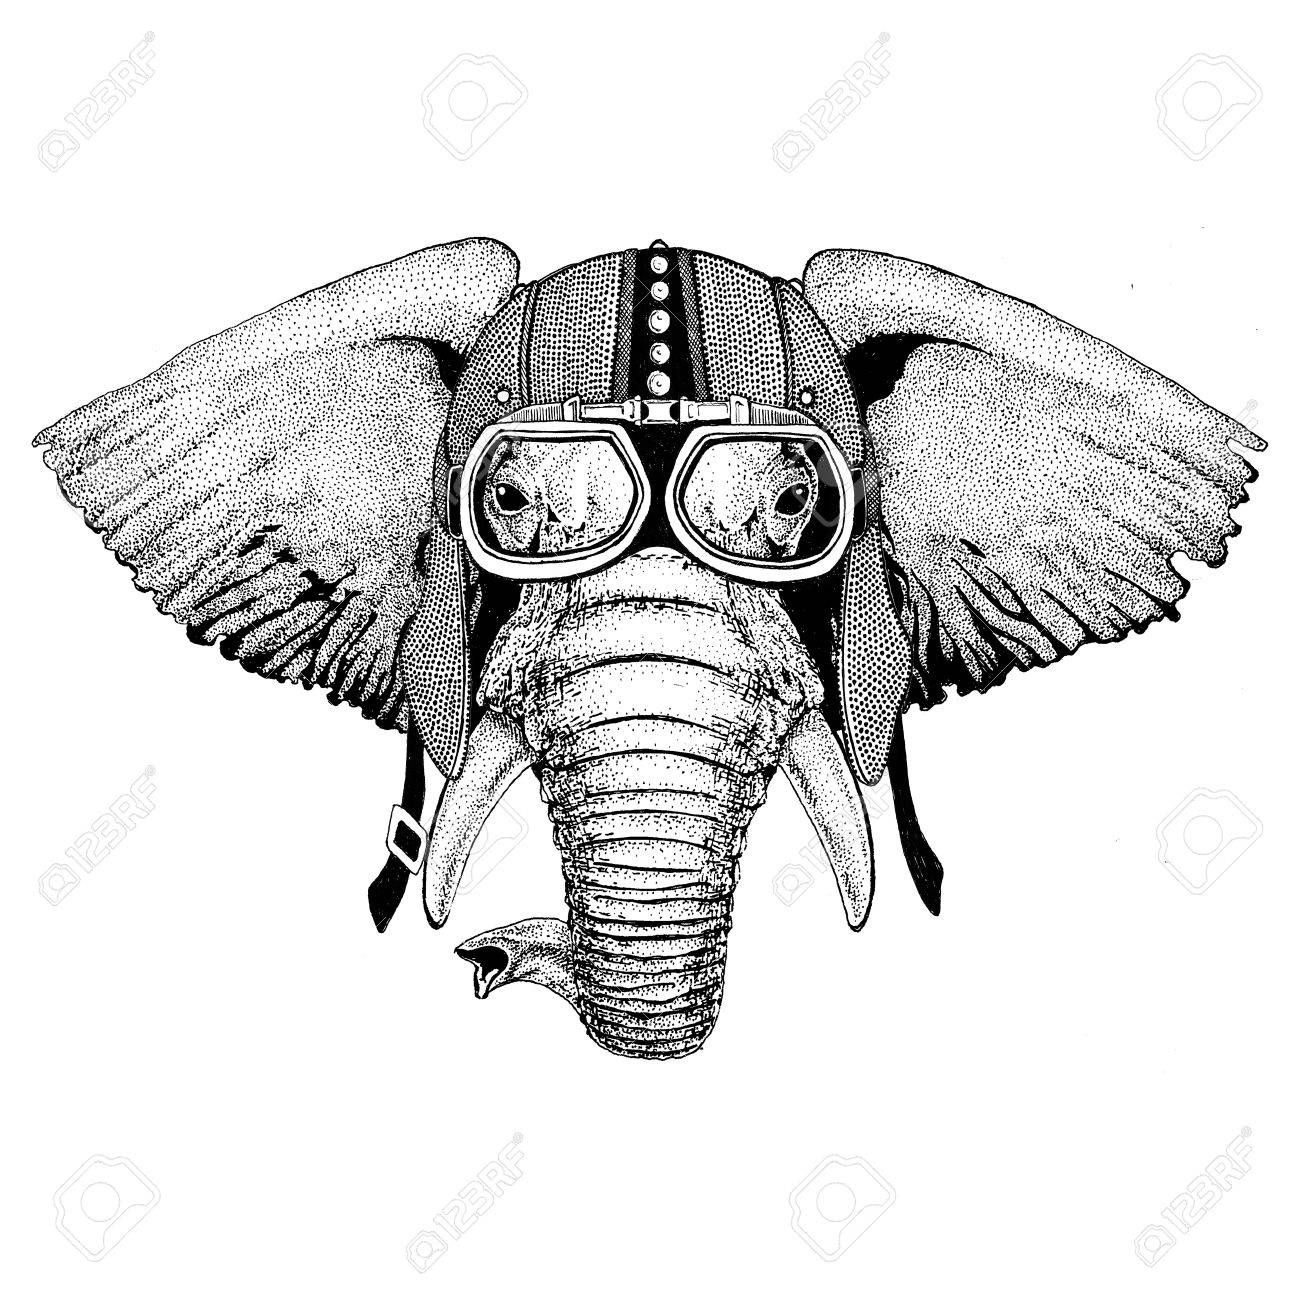 African Or Indian Elephant Motorcycle Biker Aviator Fly Club Illustration For Tattoo T Shirt Emblem Badge Logo Patch Banco De Imagens Royalty Free Ilustracoes Imagens E Banco De Imagens Image 82119944